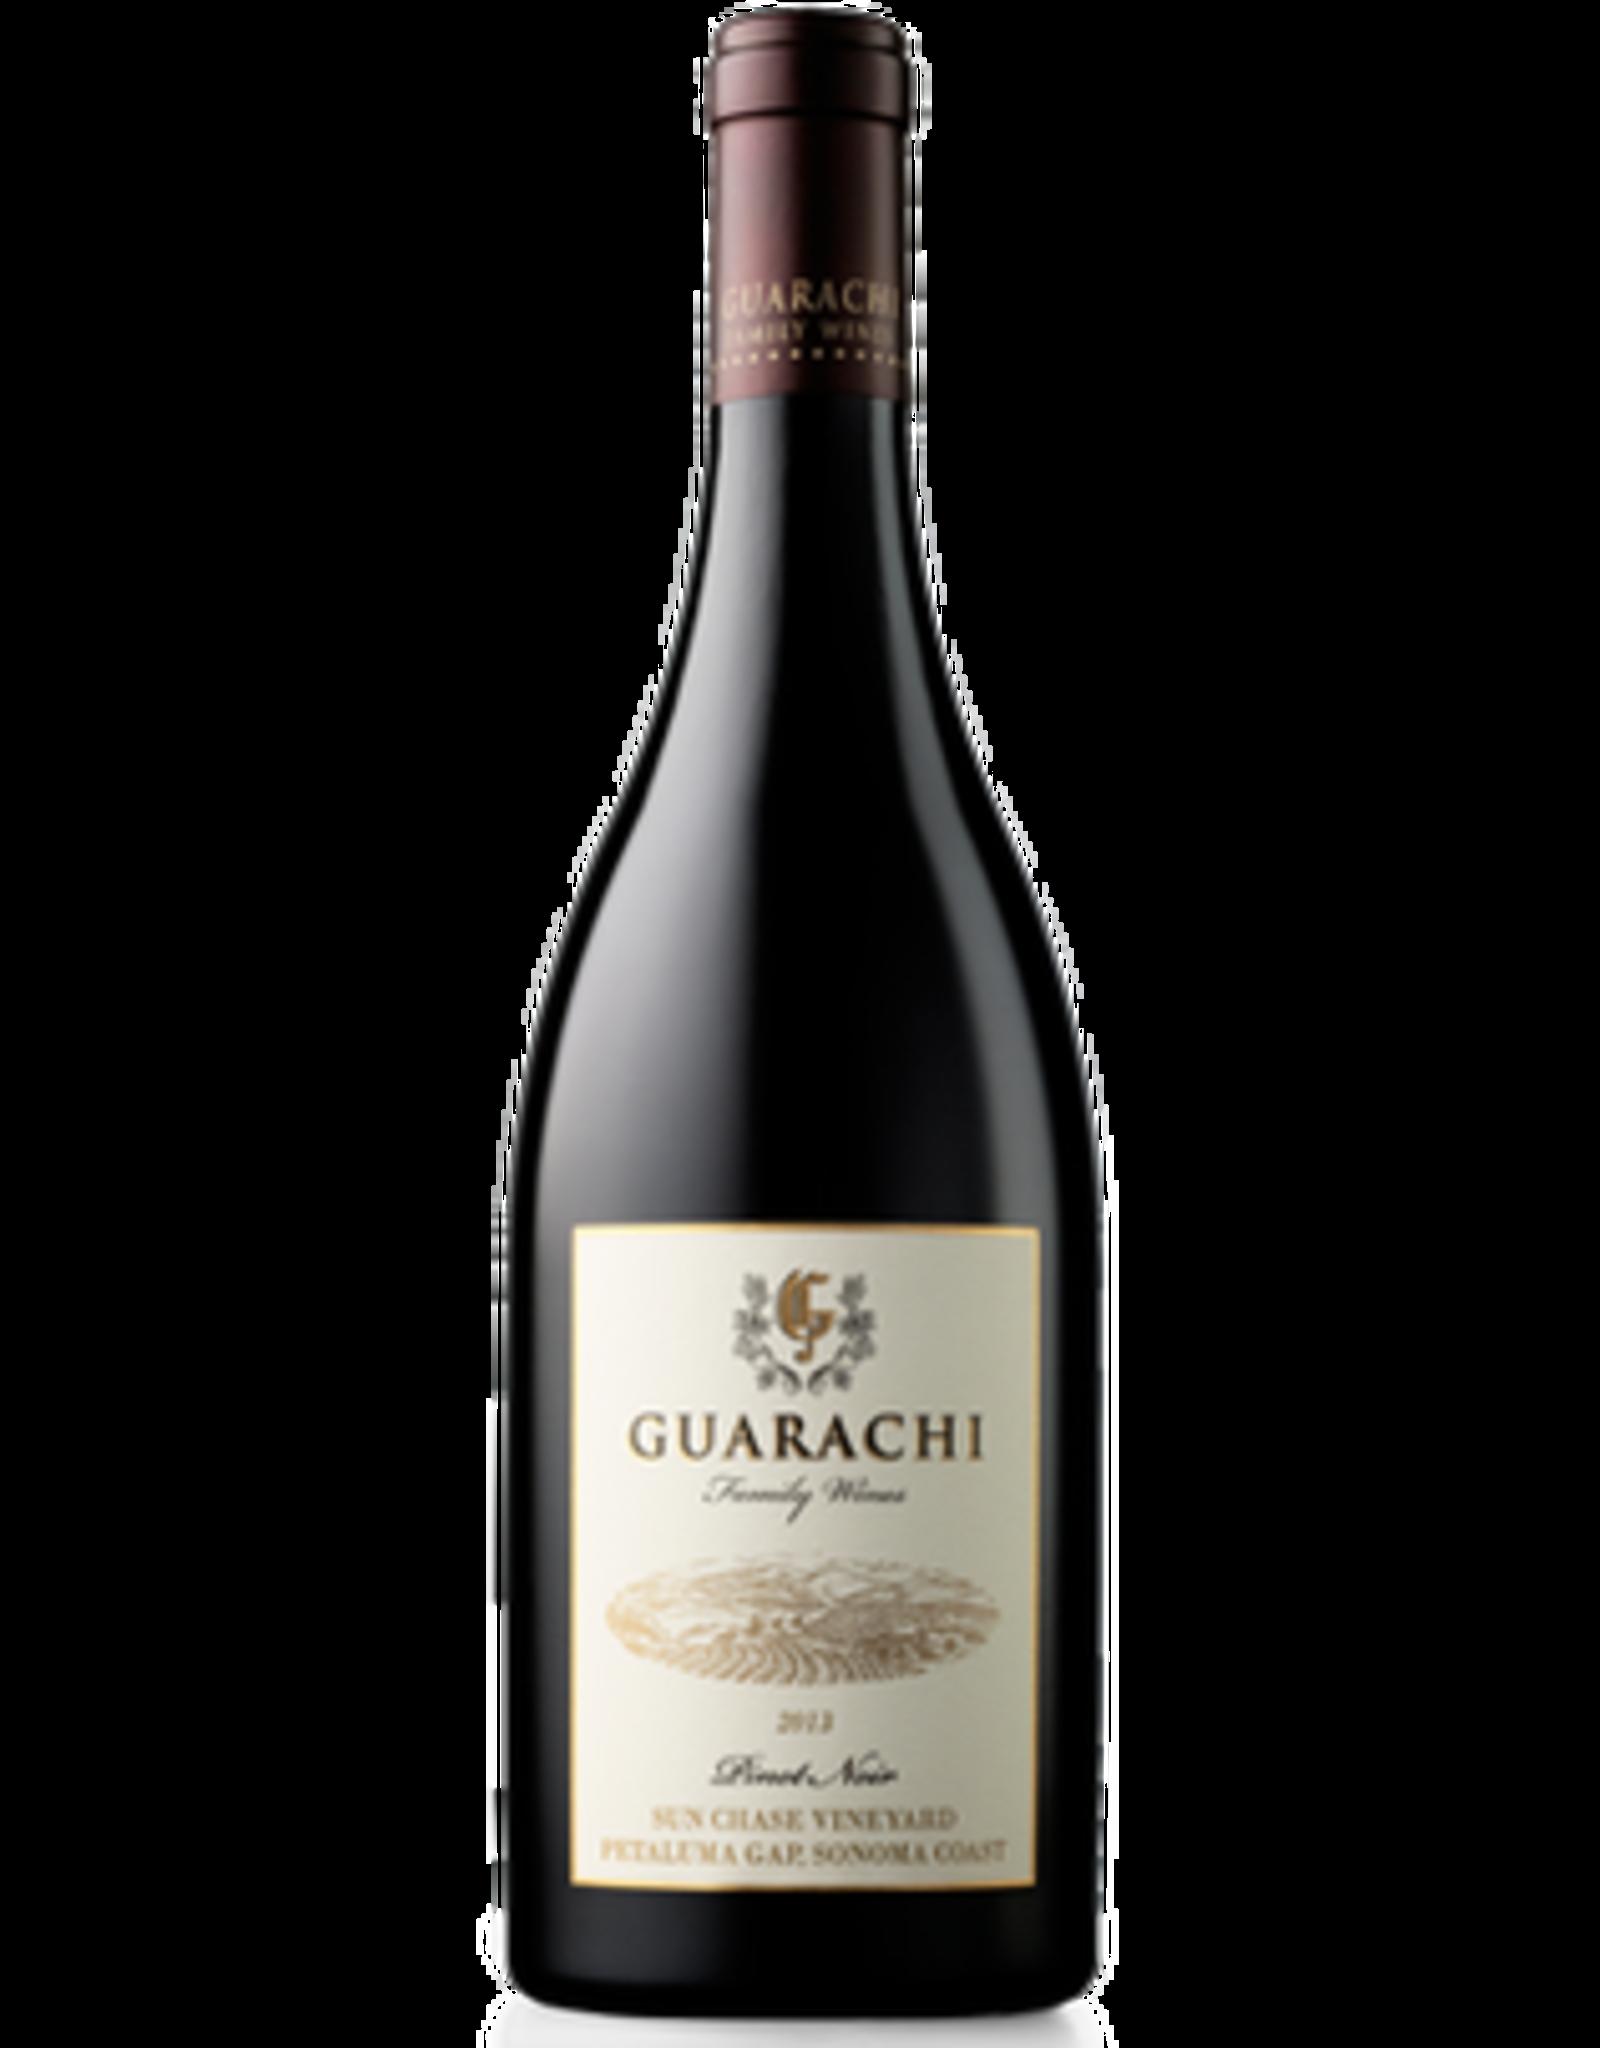 Red Wine 2013, Guarachi Sun Chase Single Vineyard, Pinot Noir, Sonoma Coast, Sonoma County, California, 14.5% Alc, CT92, TW94